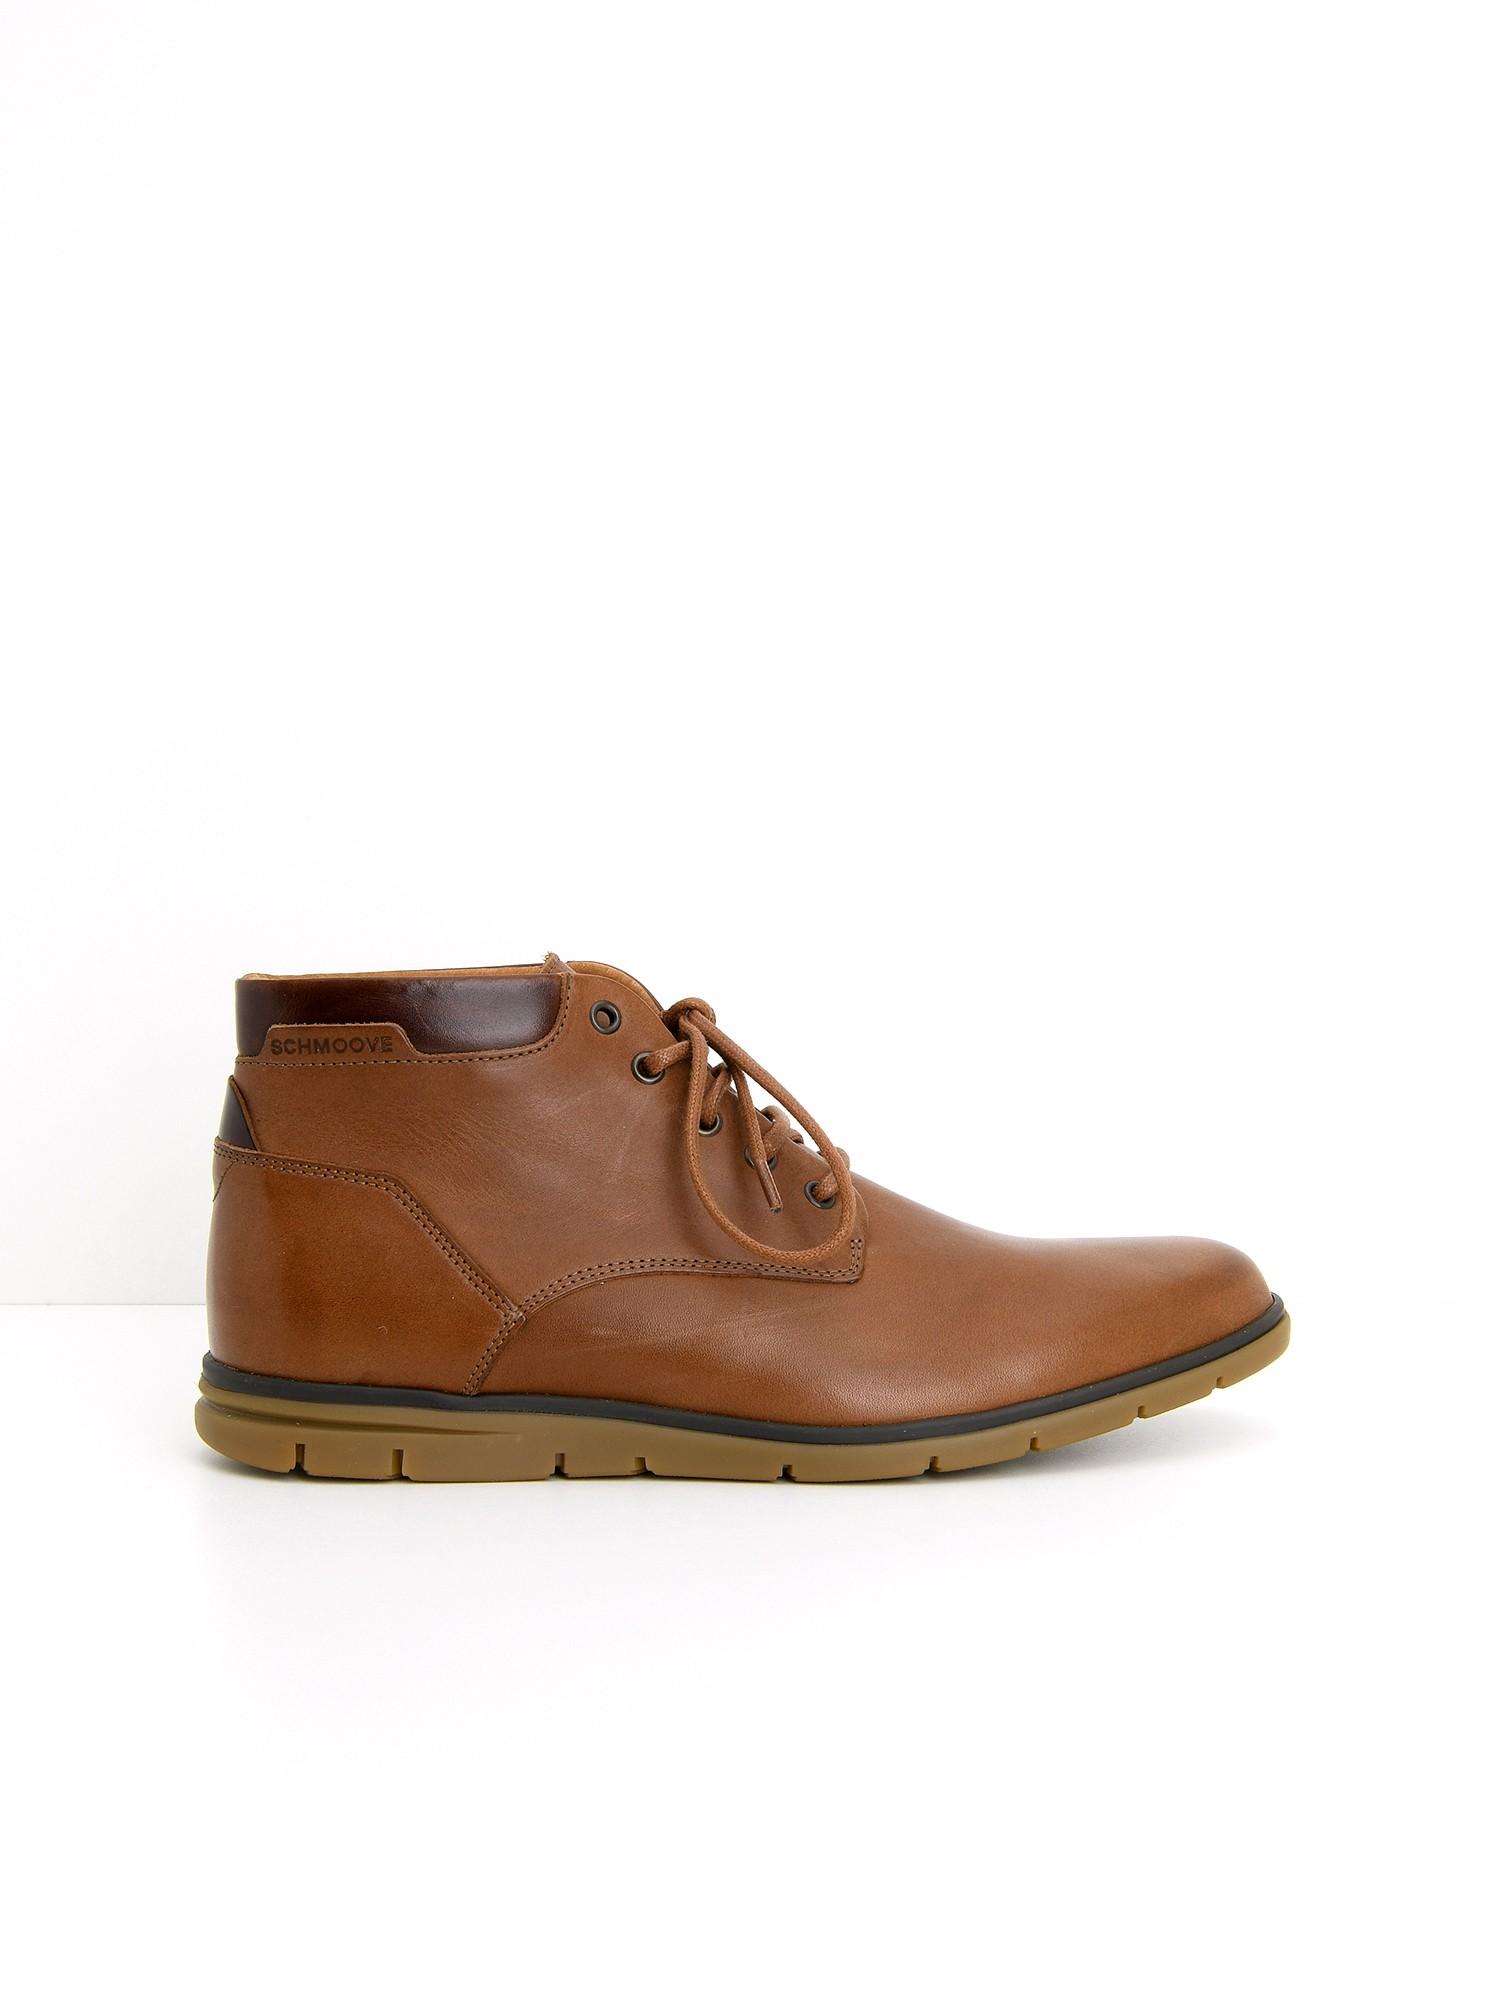 d3adba134bee3 Chaussures Shaft Mid - Etna Ciclon - Cognac Horse - Schmoove